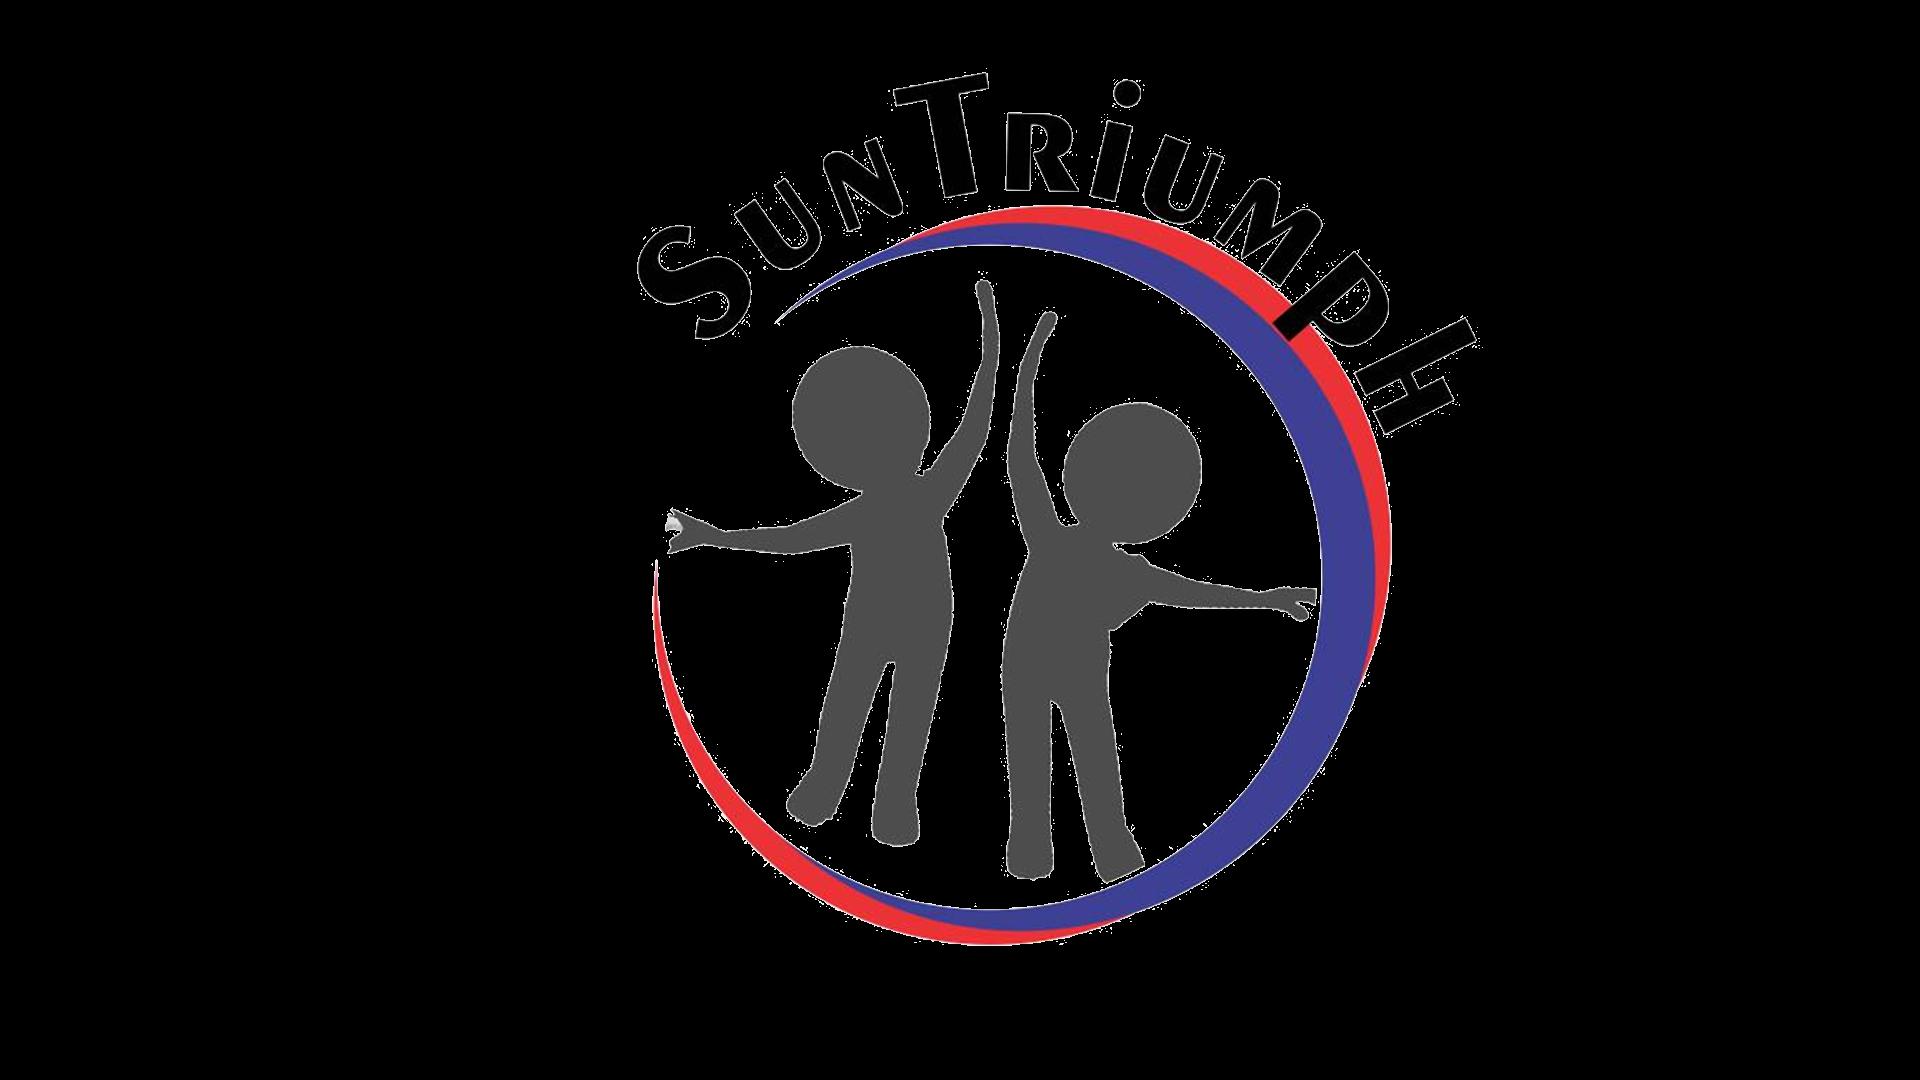 Suntriumph International Limited